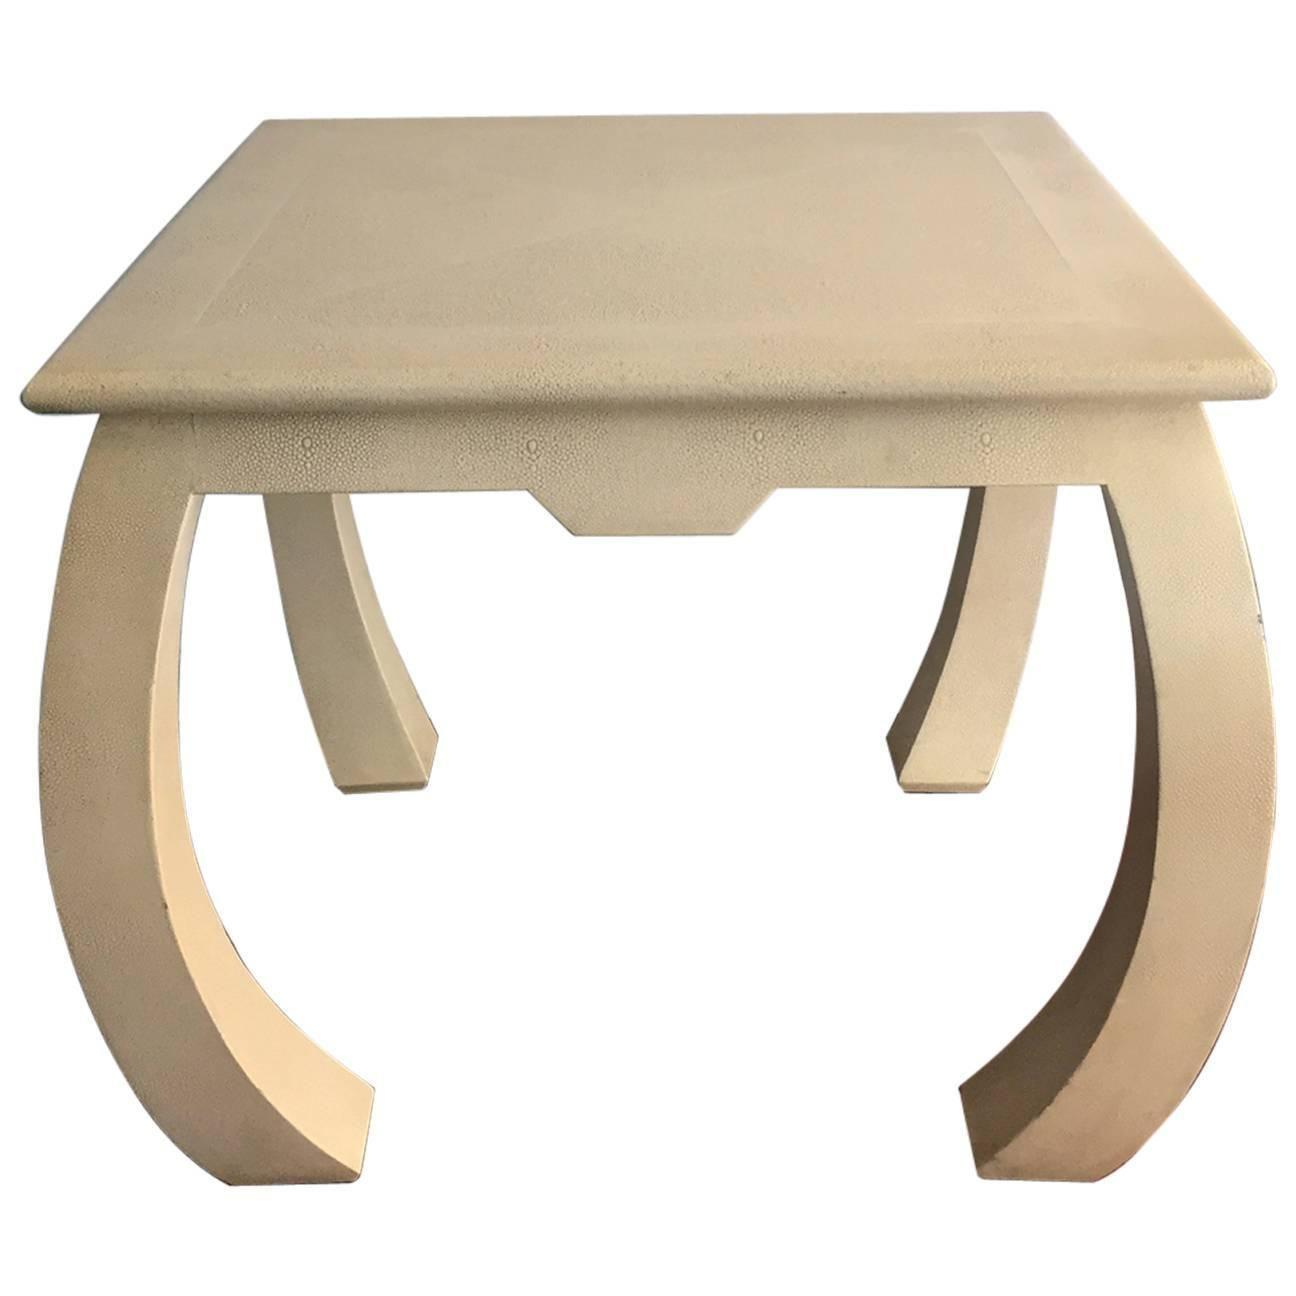 Shagreen Leather Table by Enrique Garcel Modern side